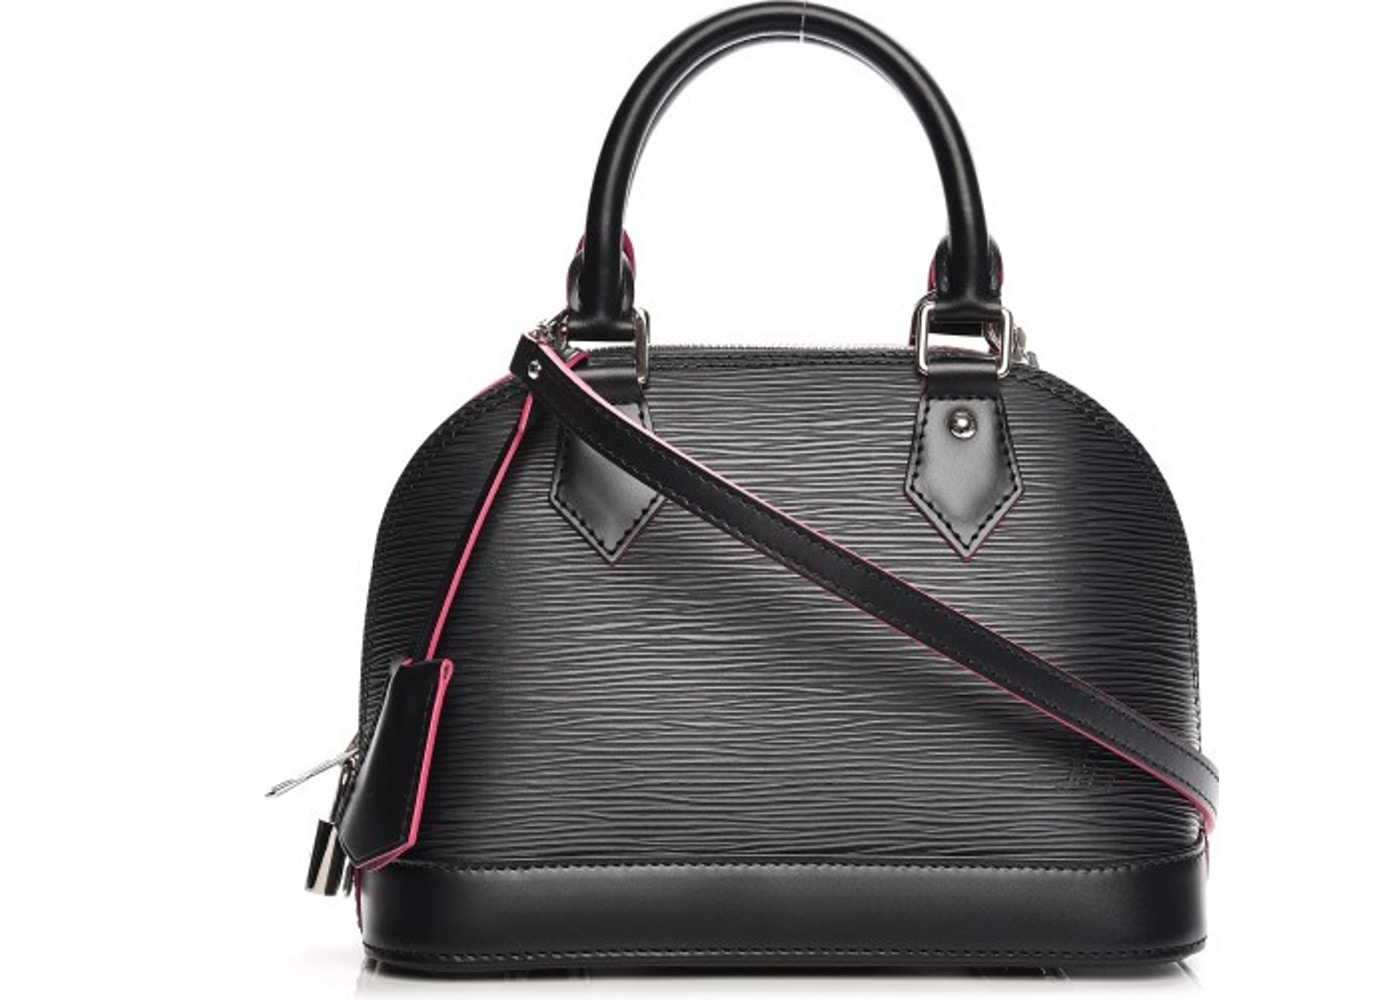 Buy   Sell Louis Vuitton Alma Handbags - Price Premium ad9151504fa24